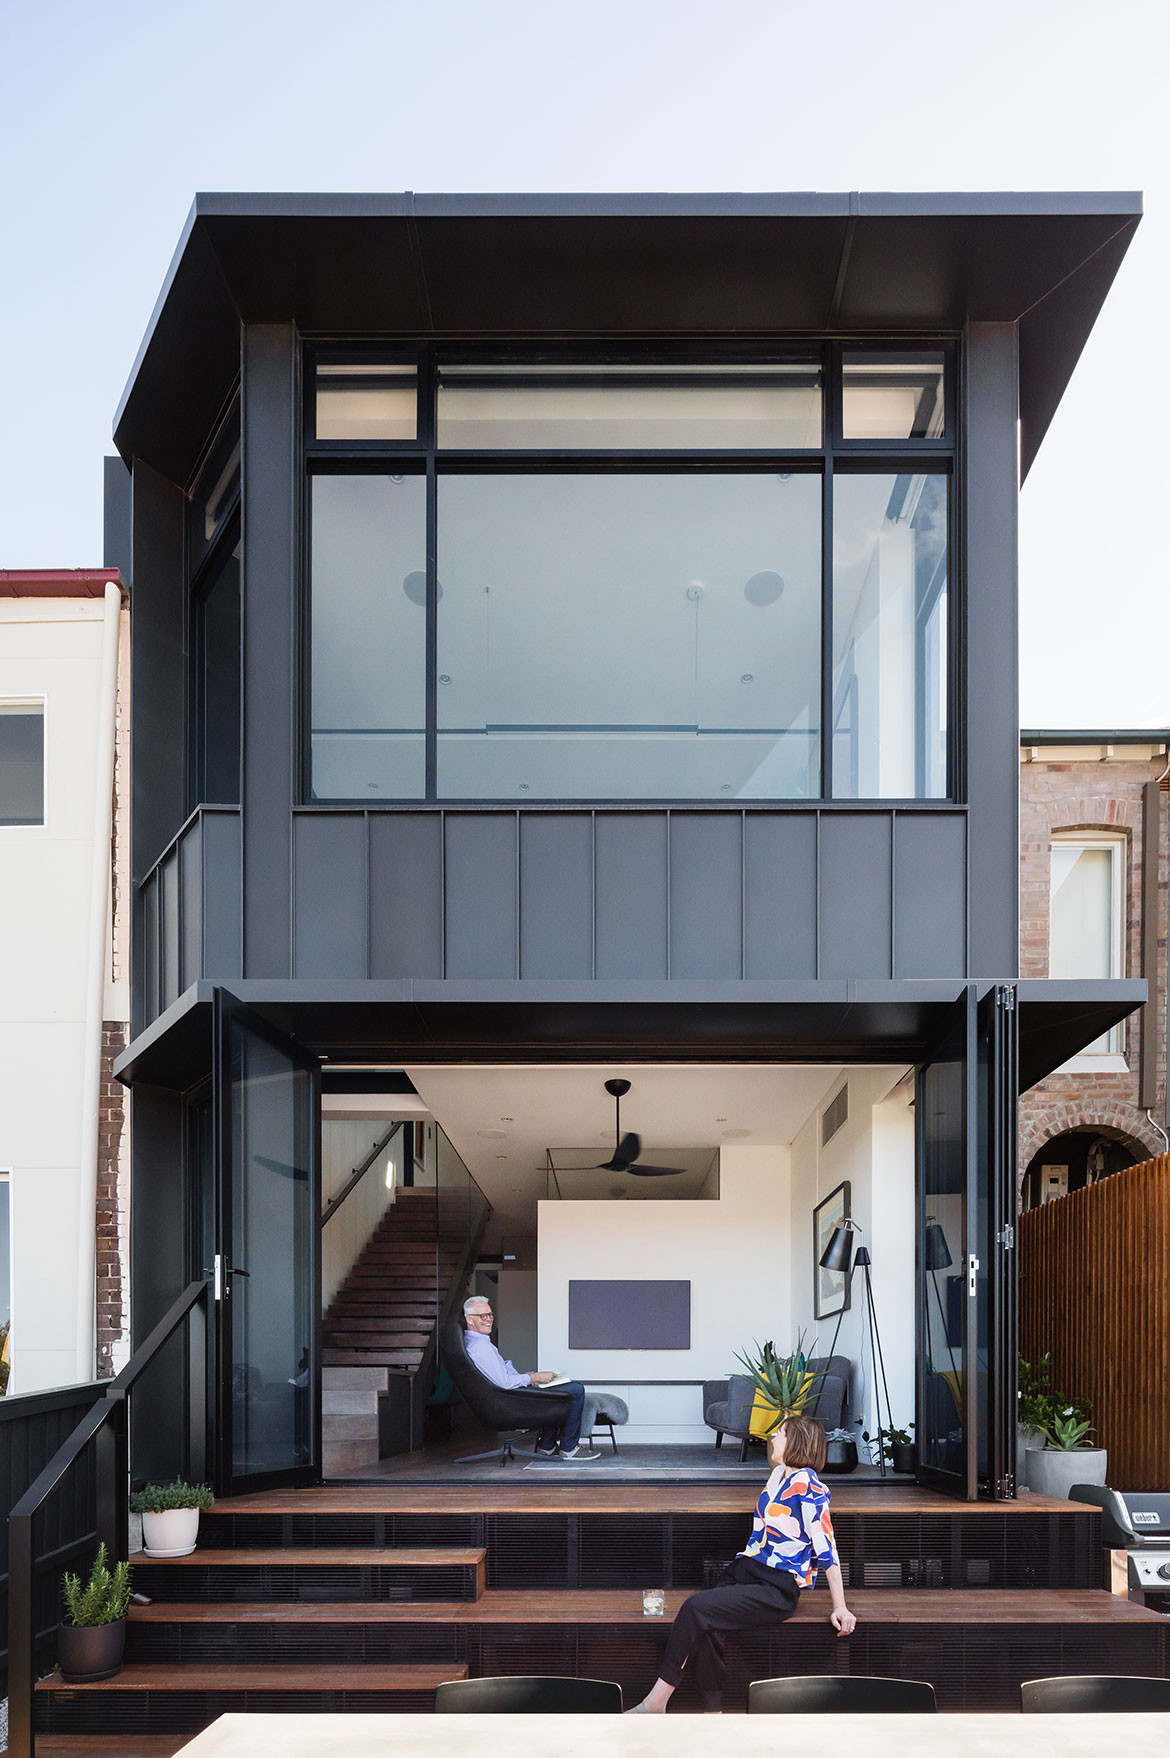 Doorzien House Bijl Architecture cc Katherine Lu exterior facade